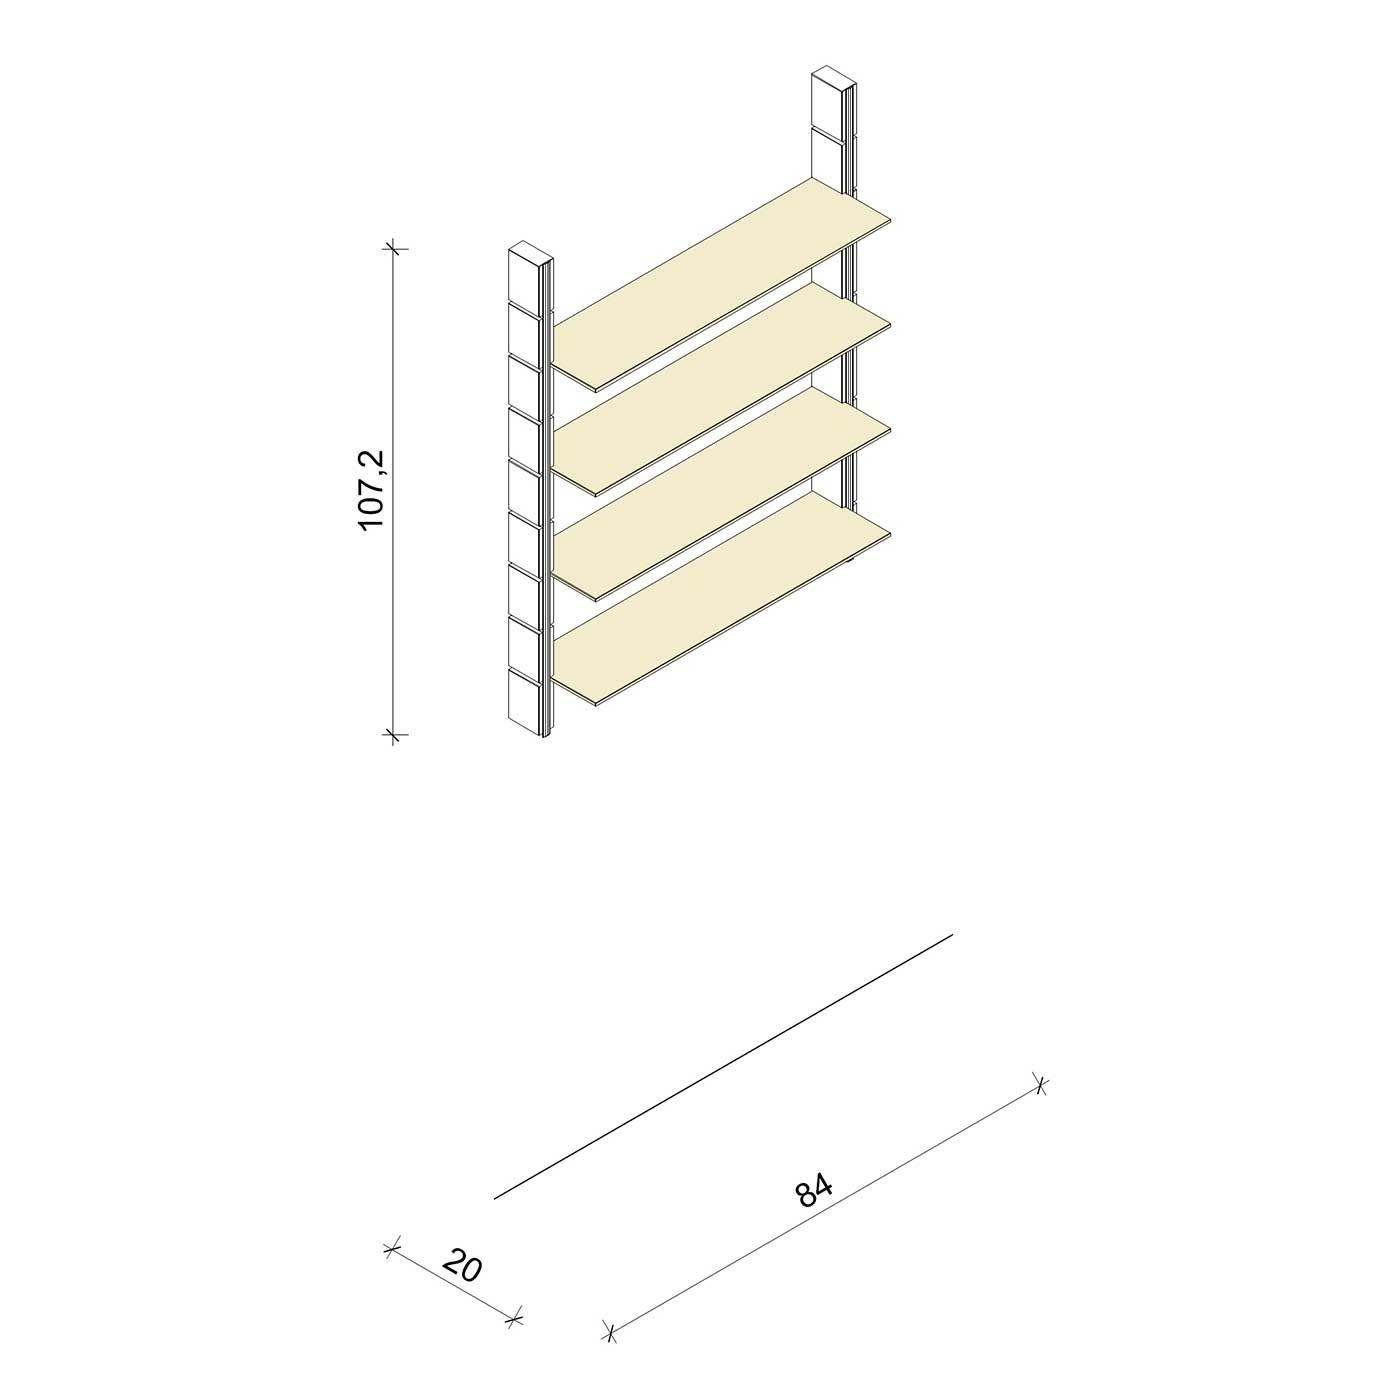 Bücherregal - Classic (M) 84 - Maß: 84 x 107,2 x 20 cm (B x H x T)